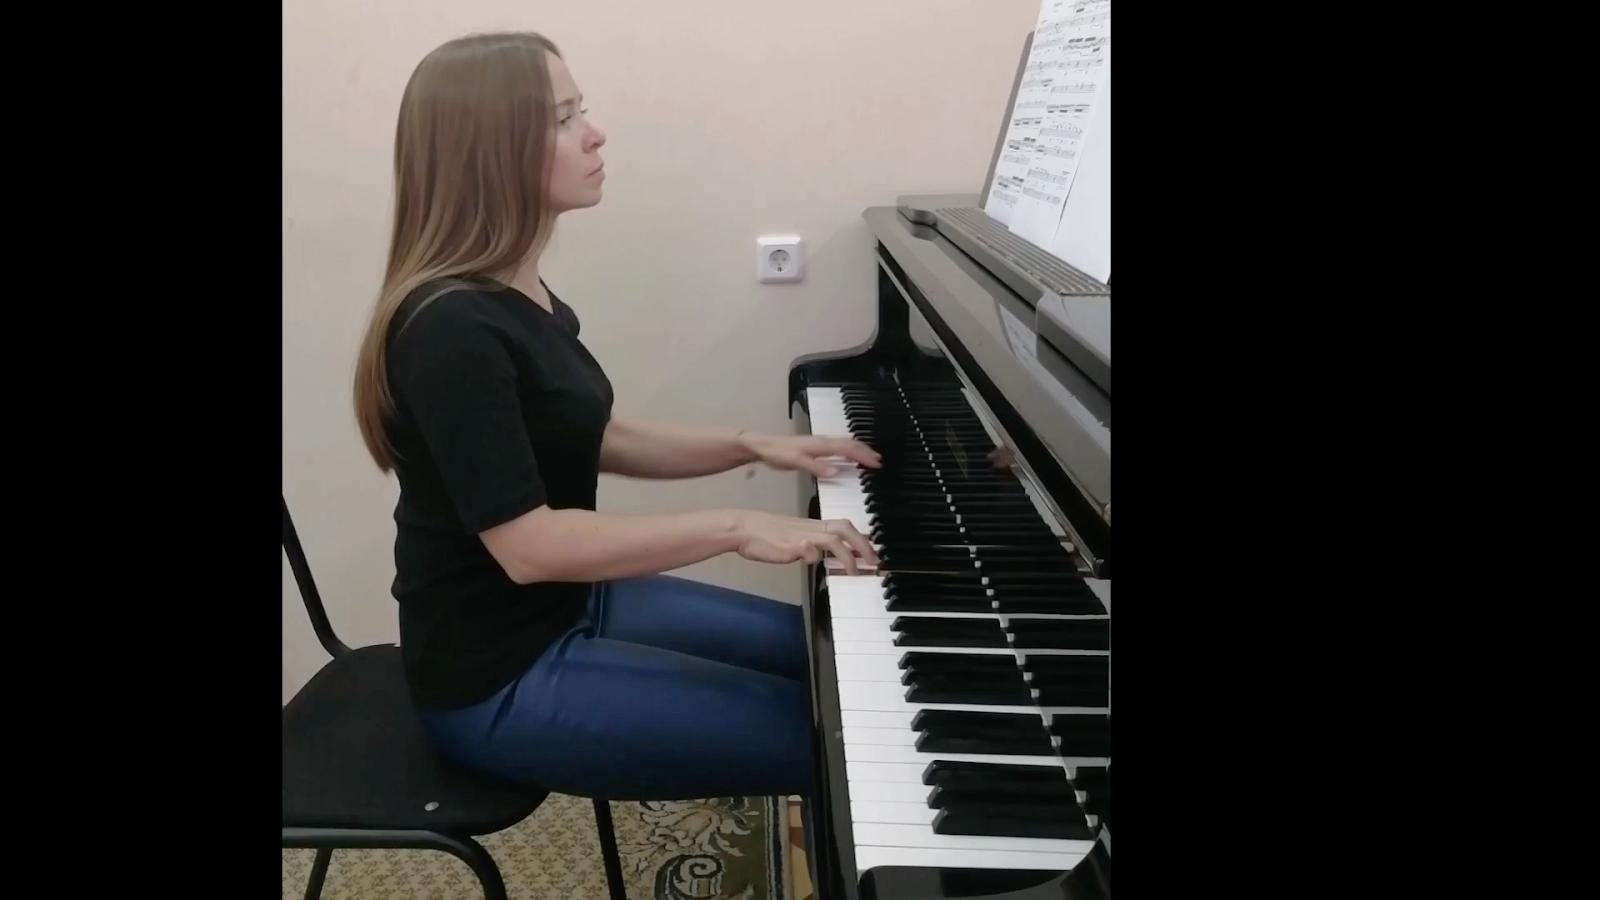 مسحور آهنگساز کوشا میرزایی پیانیست آنا سوروکینا